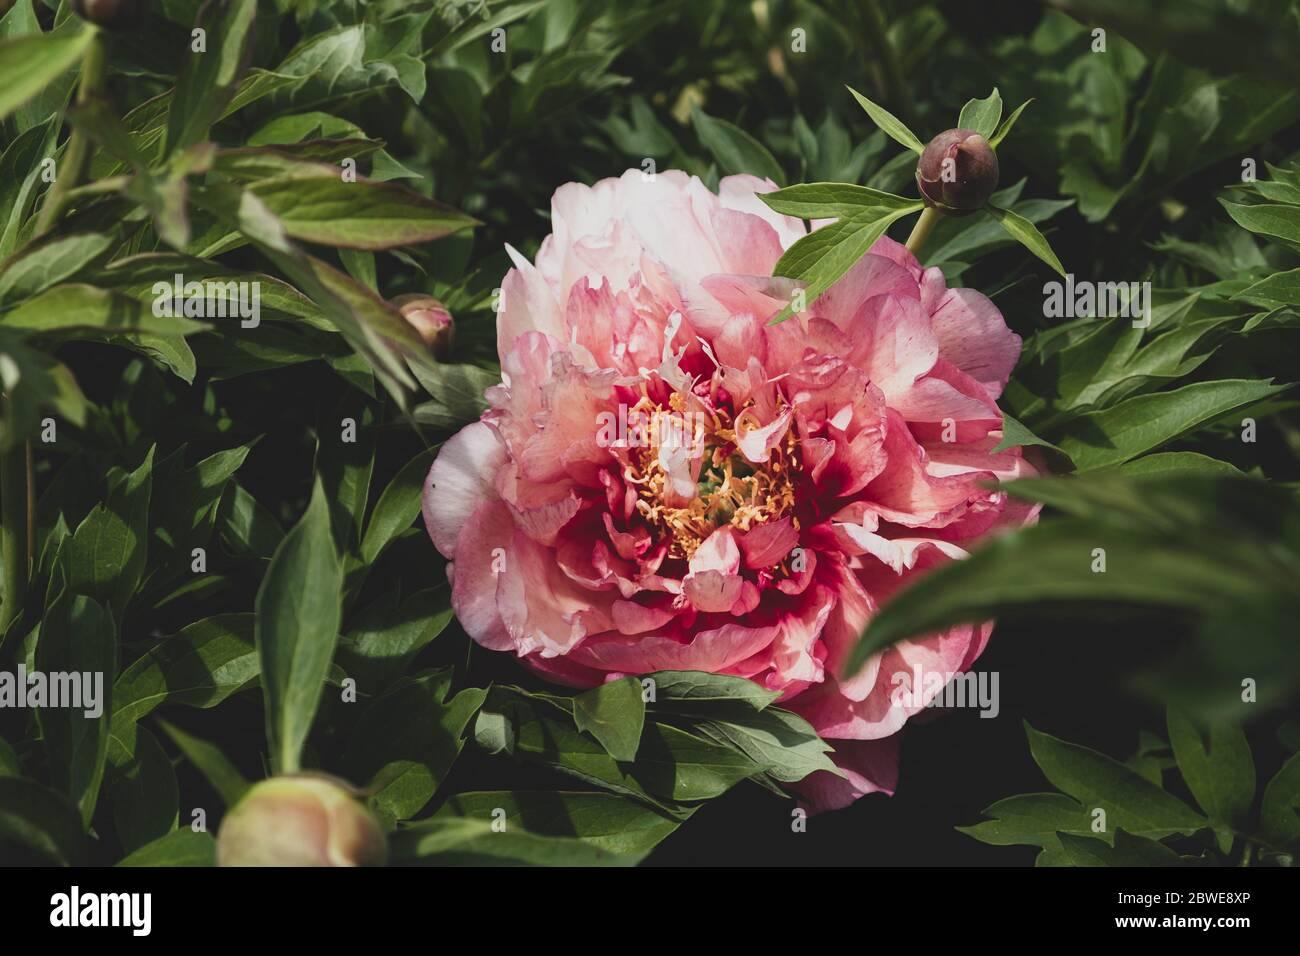 Beautiful fresh peony flower in full bloom in the garden. Stock Photo